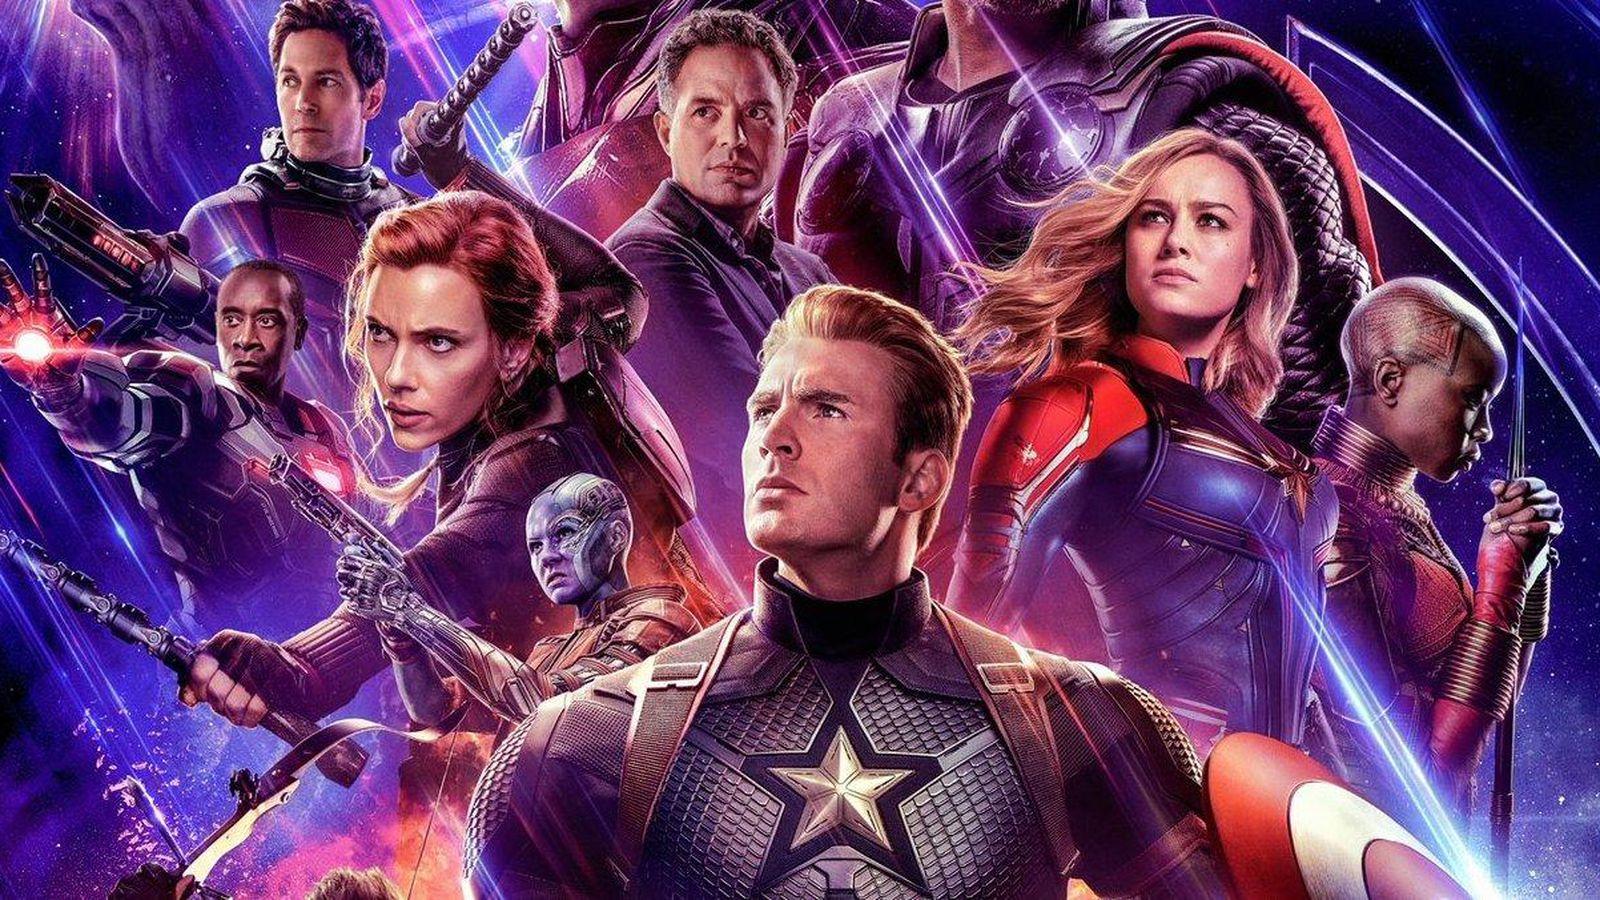 2019 Phillies hype video gets Avengers Endgame treatment